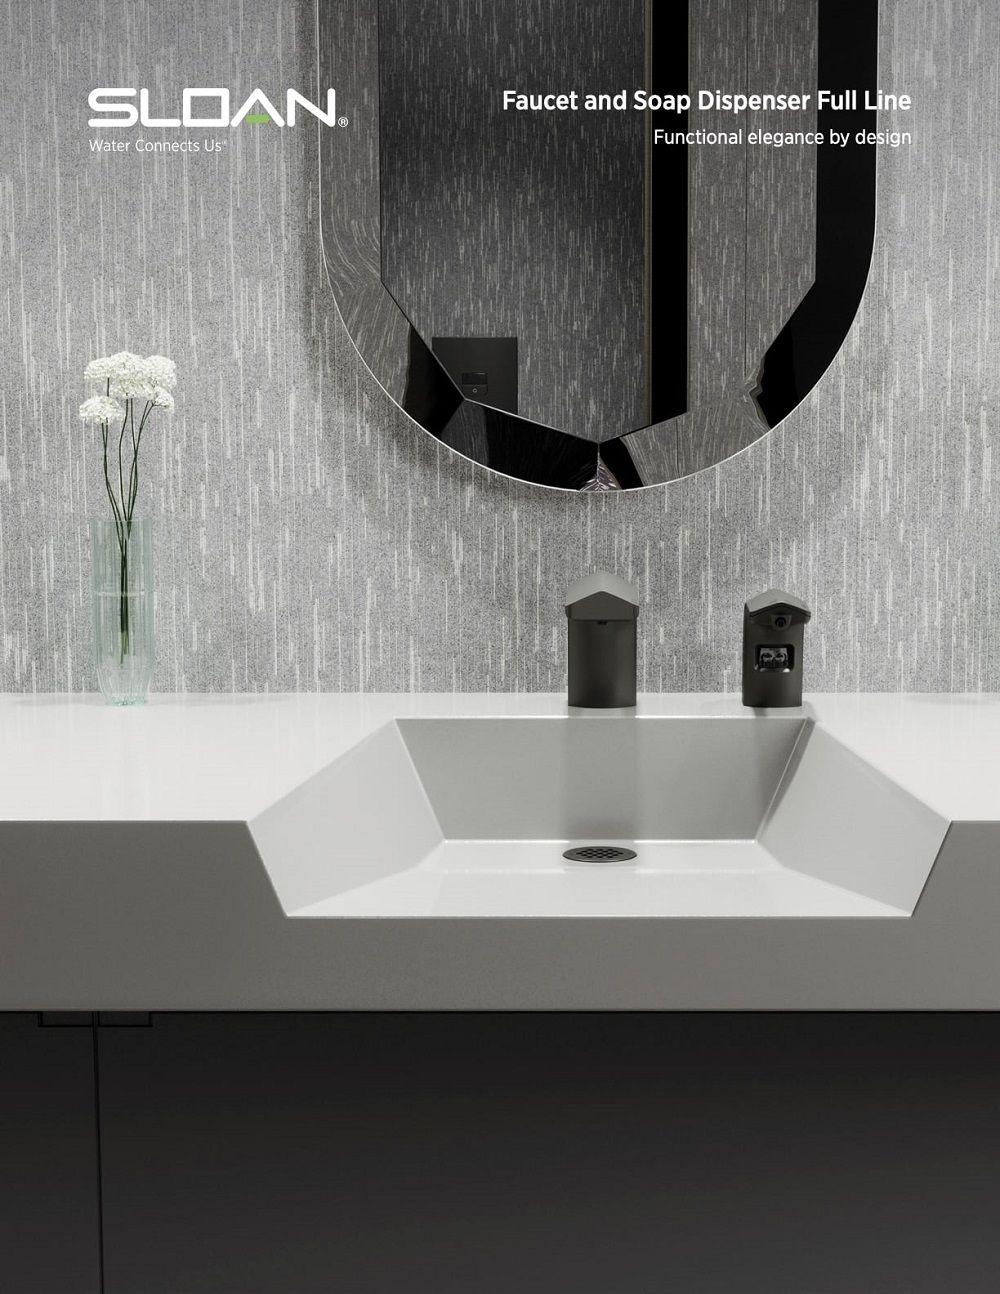 Explore Sloan S Latest Faucet Soap Dispenser Brochure In 2021 Round Mirror Bathroom Faucet Restroom Fixtures [ 1294 x 1000 Pixel ]